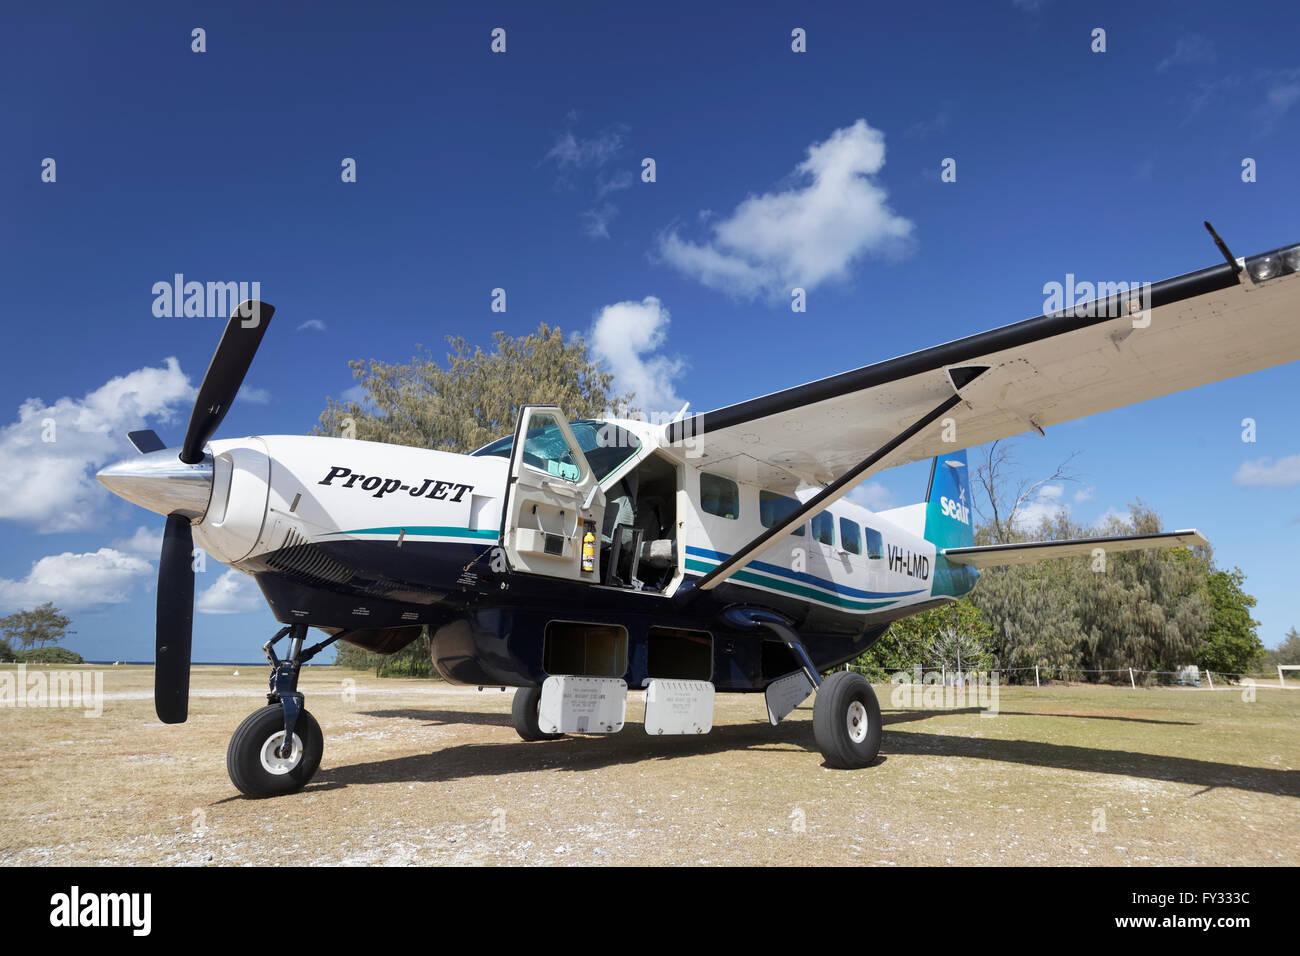 Cessna Caravan 208 Sea Air on unpaved airfield with open underfloor luggage lockers, Lady Elliot Island, Queensland, - Stock Image